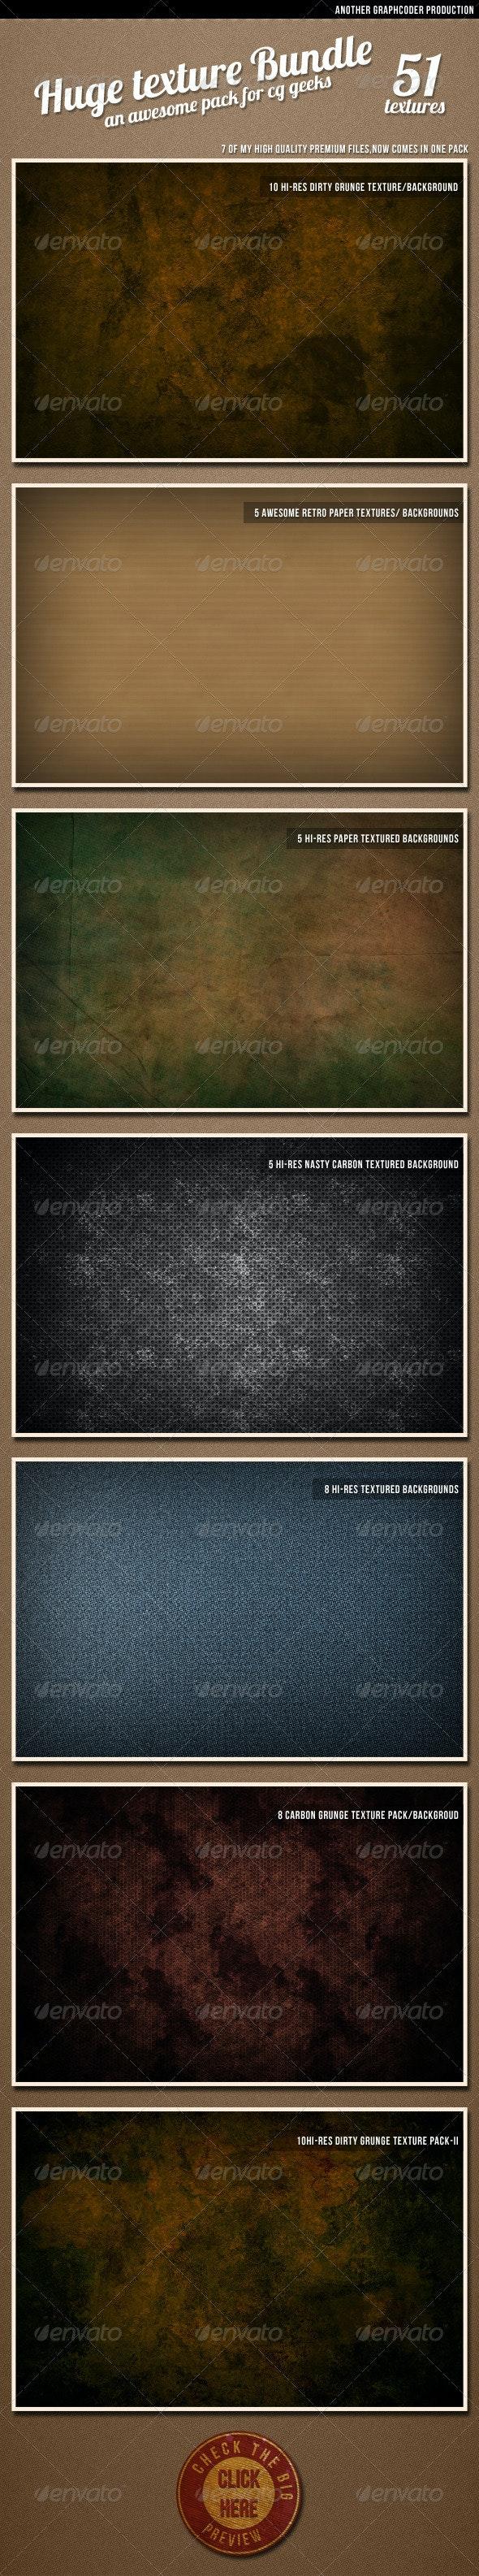 Mega Texture Bundle (a set of 51) - Industrial / Grunge Textures